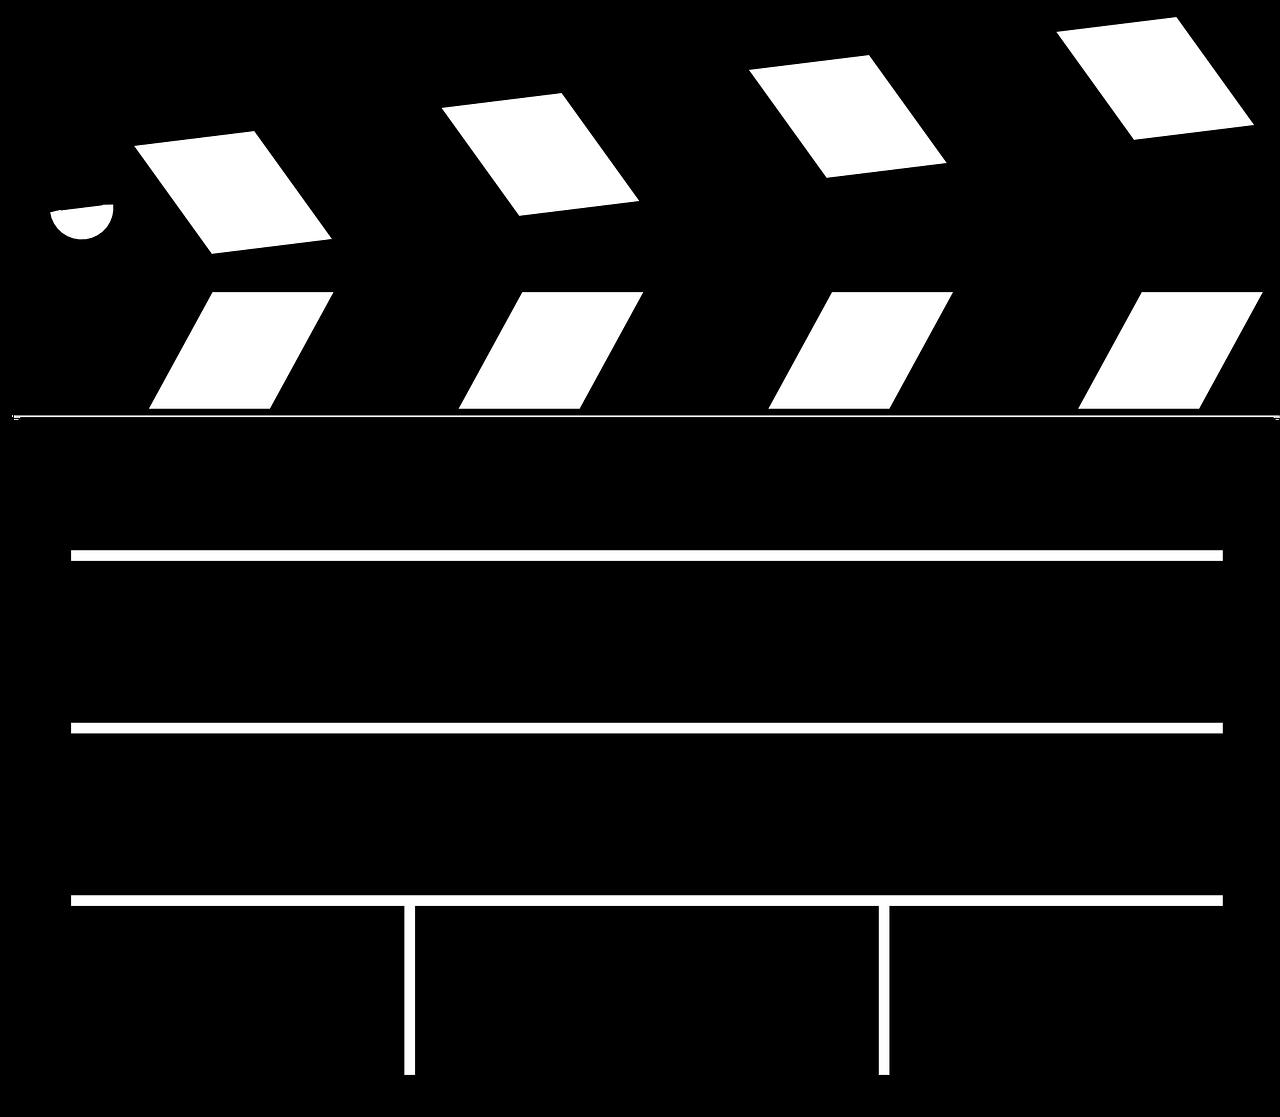 Clapboard Image